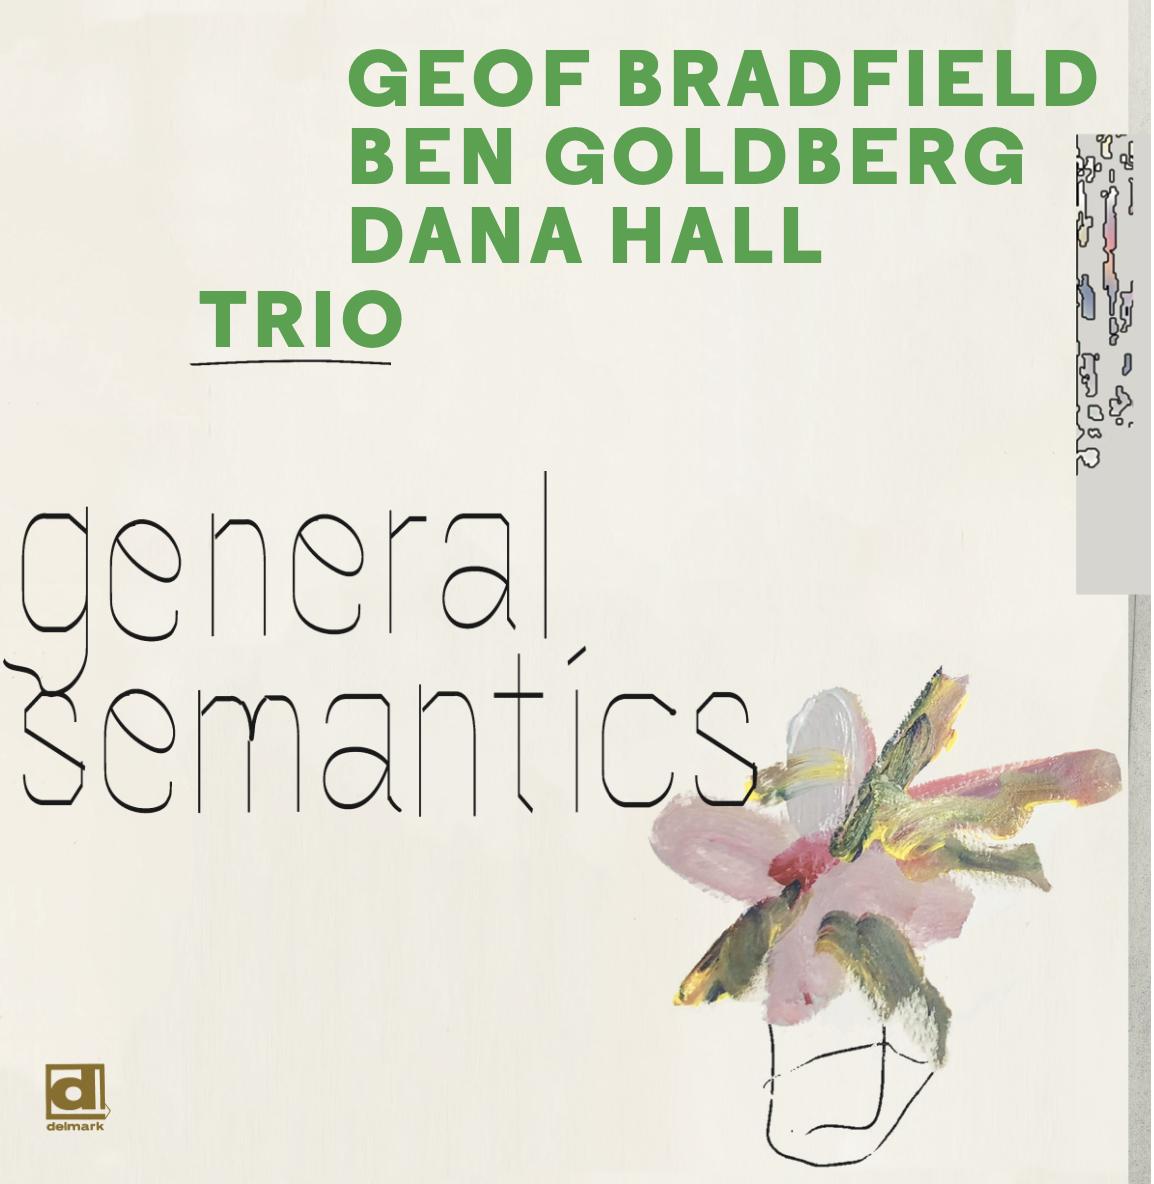 NEW RELEASE: Geof Bradfield/Ben Goldberg/Dana Hall's GENERAL SEMANTICS out 9/18 via Delmark Records